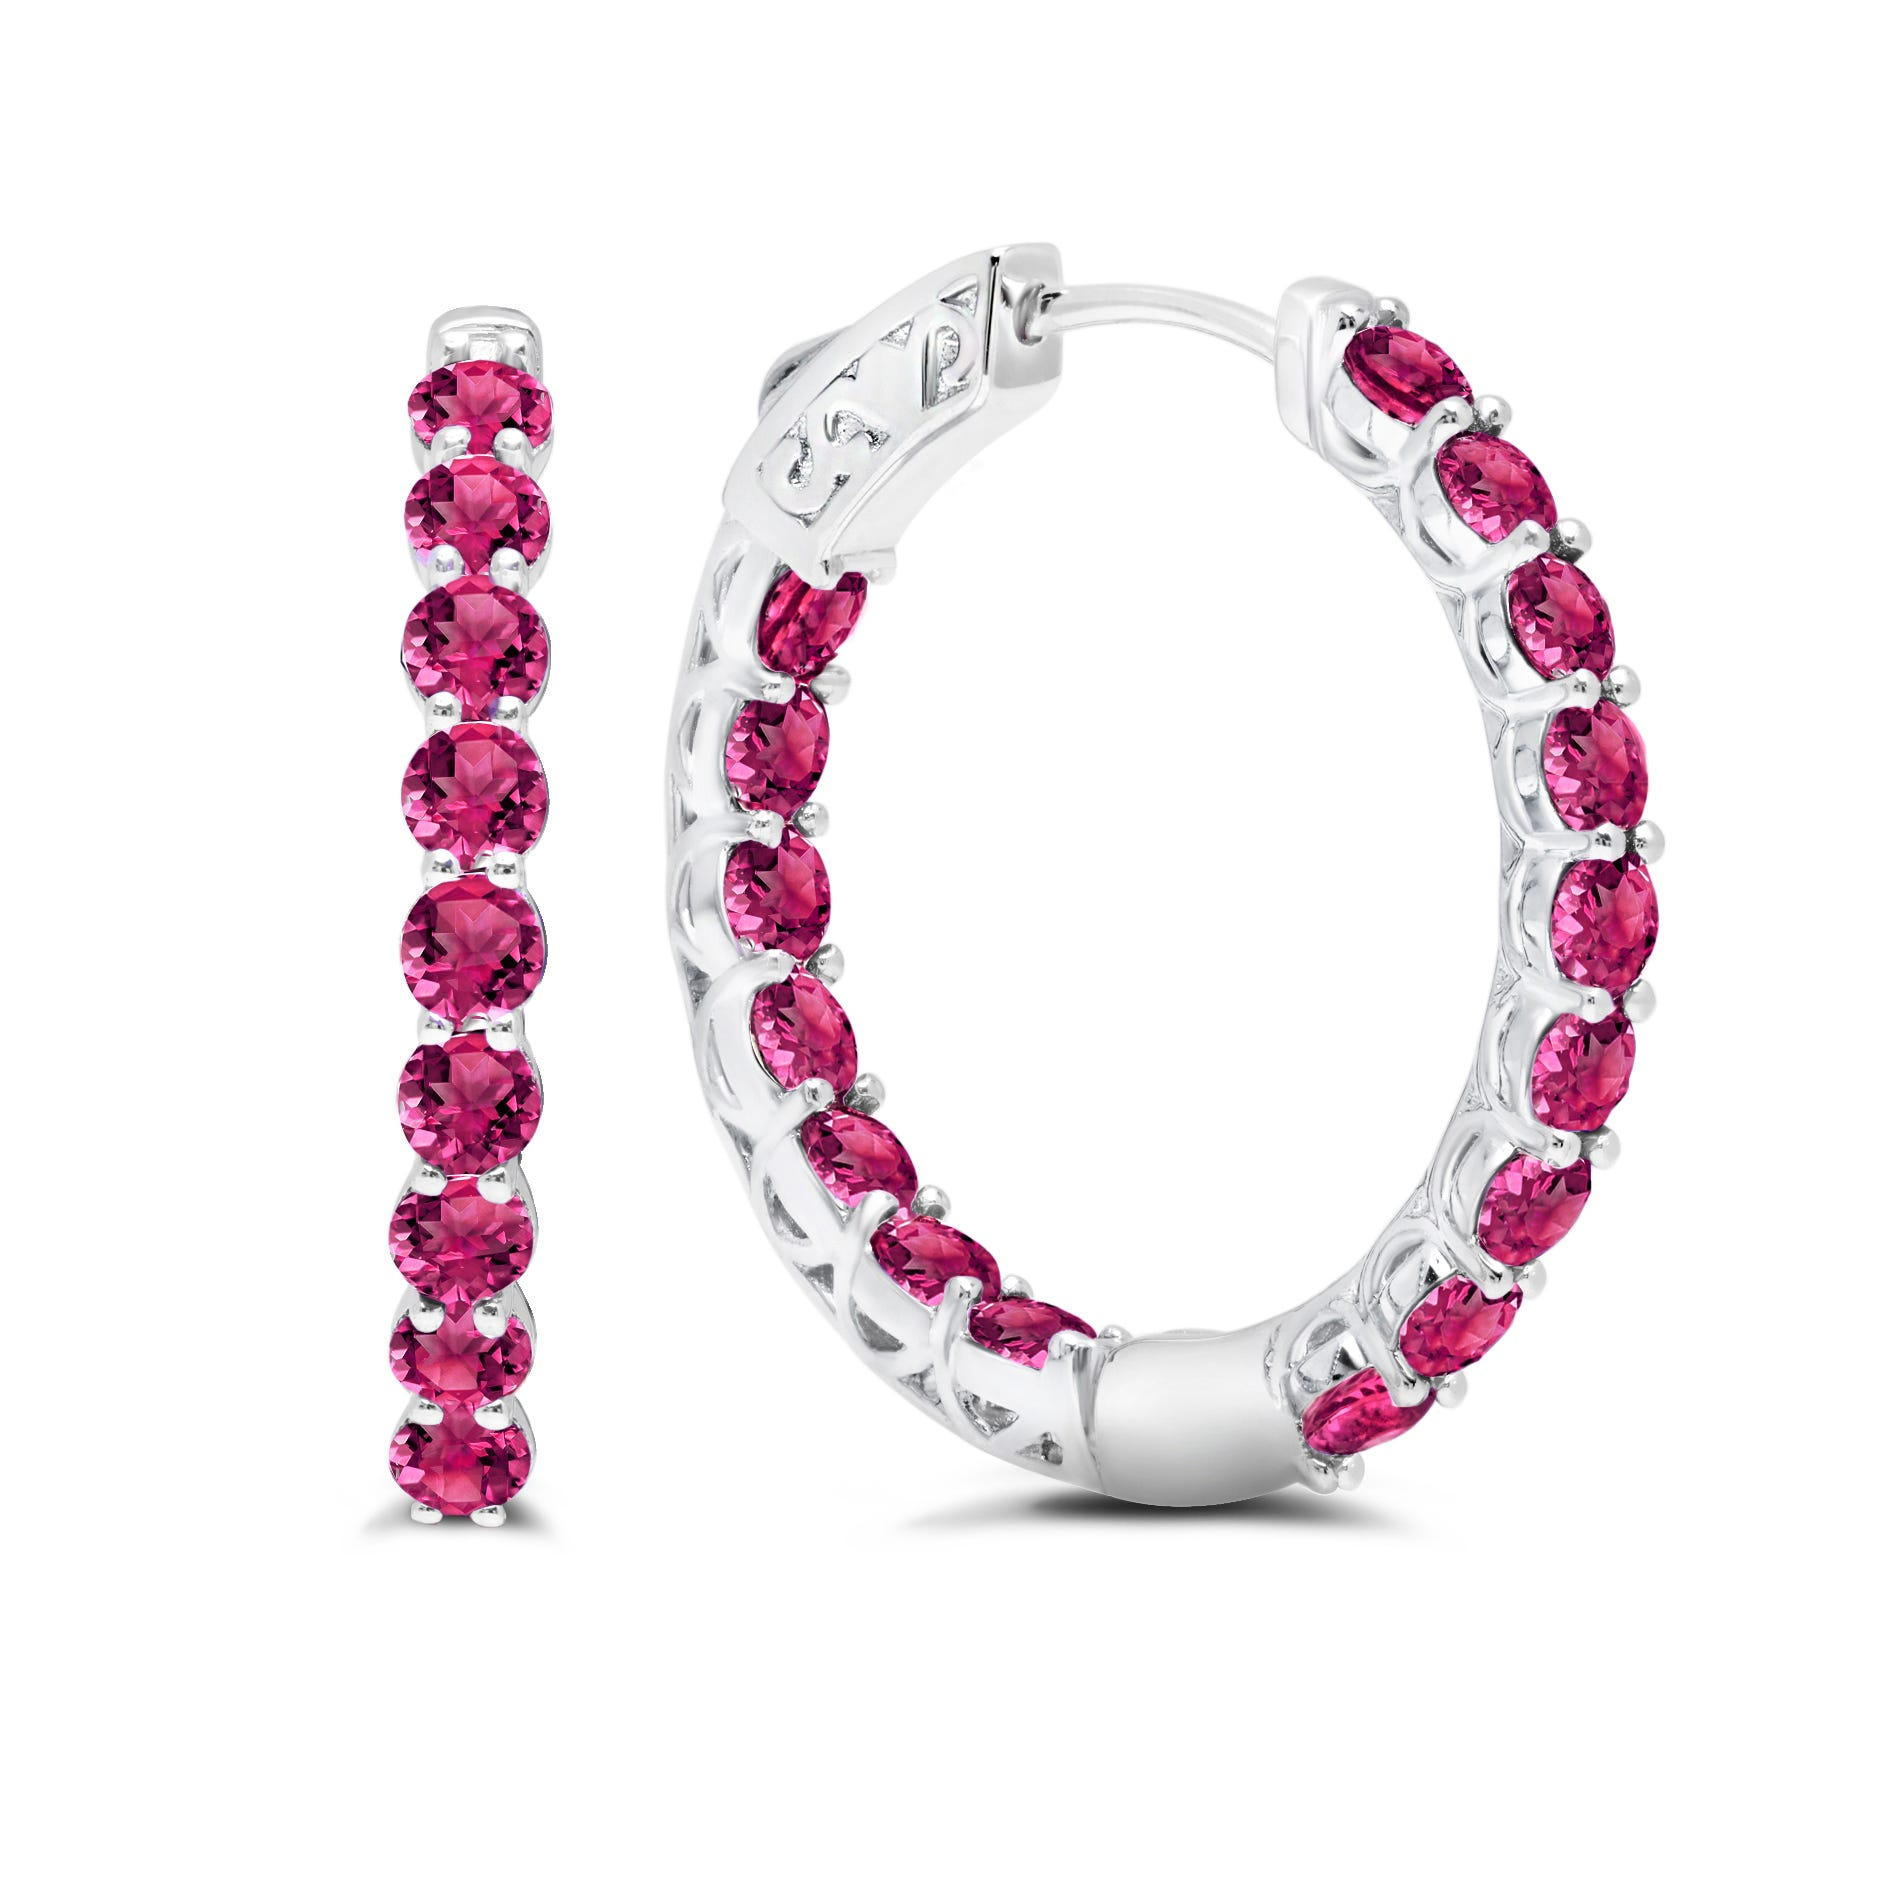 Ruby Inside-Out Hoop Earrings in Sterling Silver